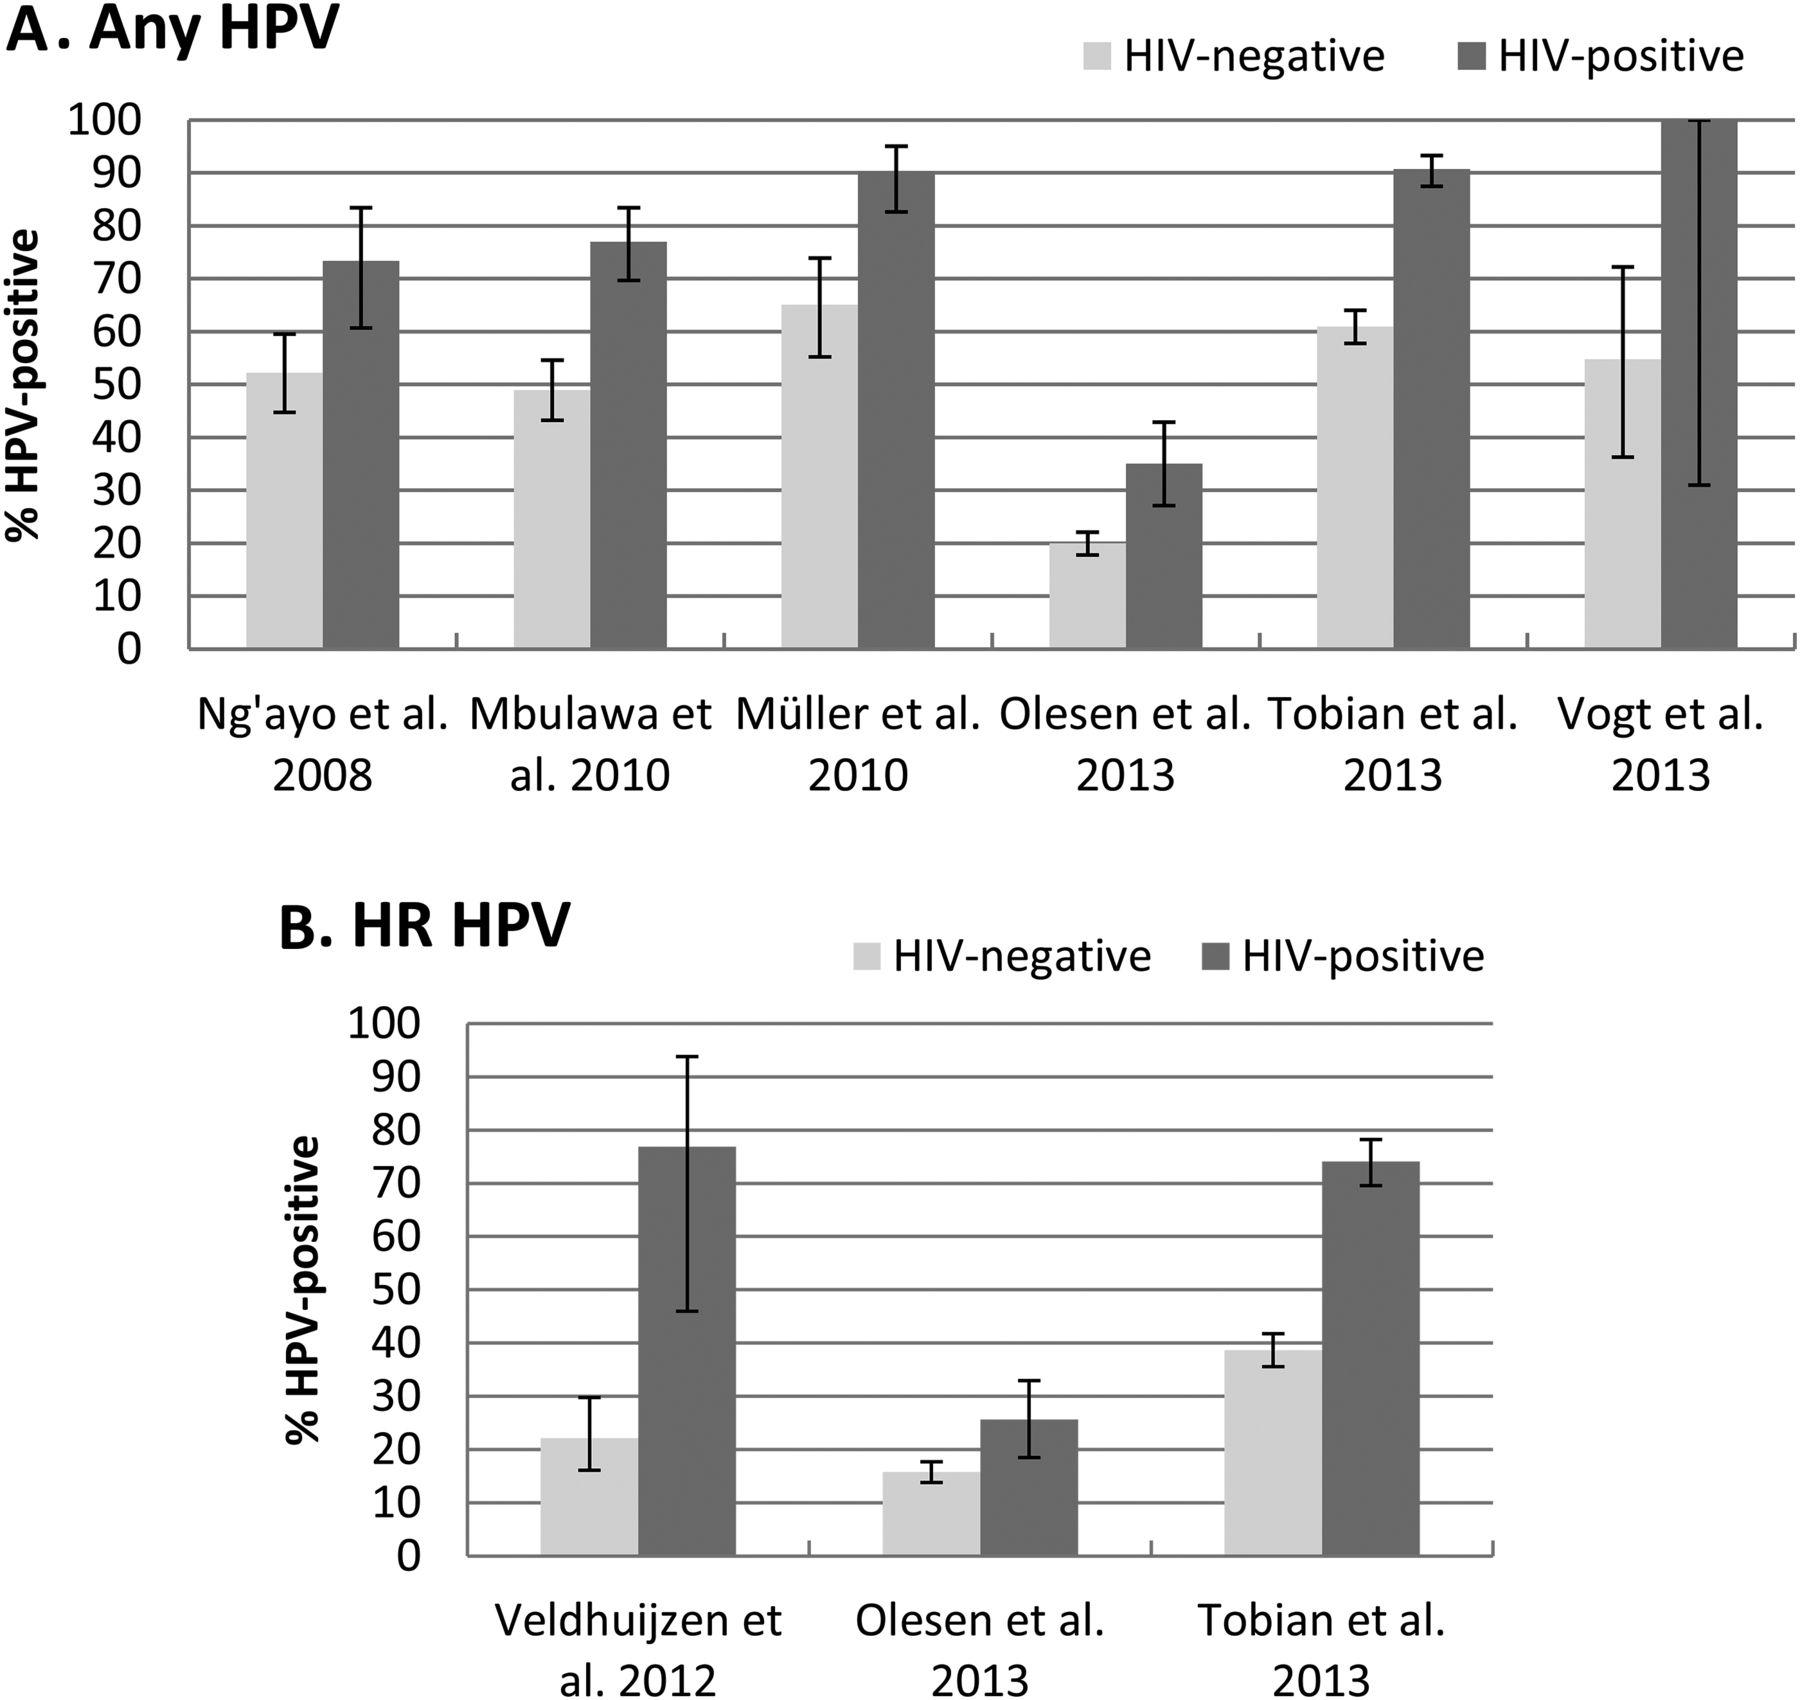 Human papillomavirus prevalence among men in sub-Saharan Africa: a